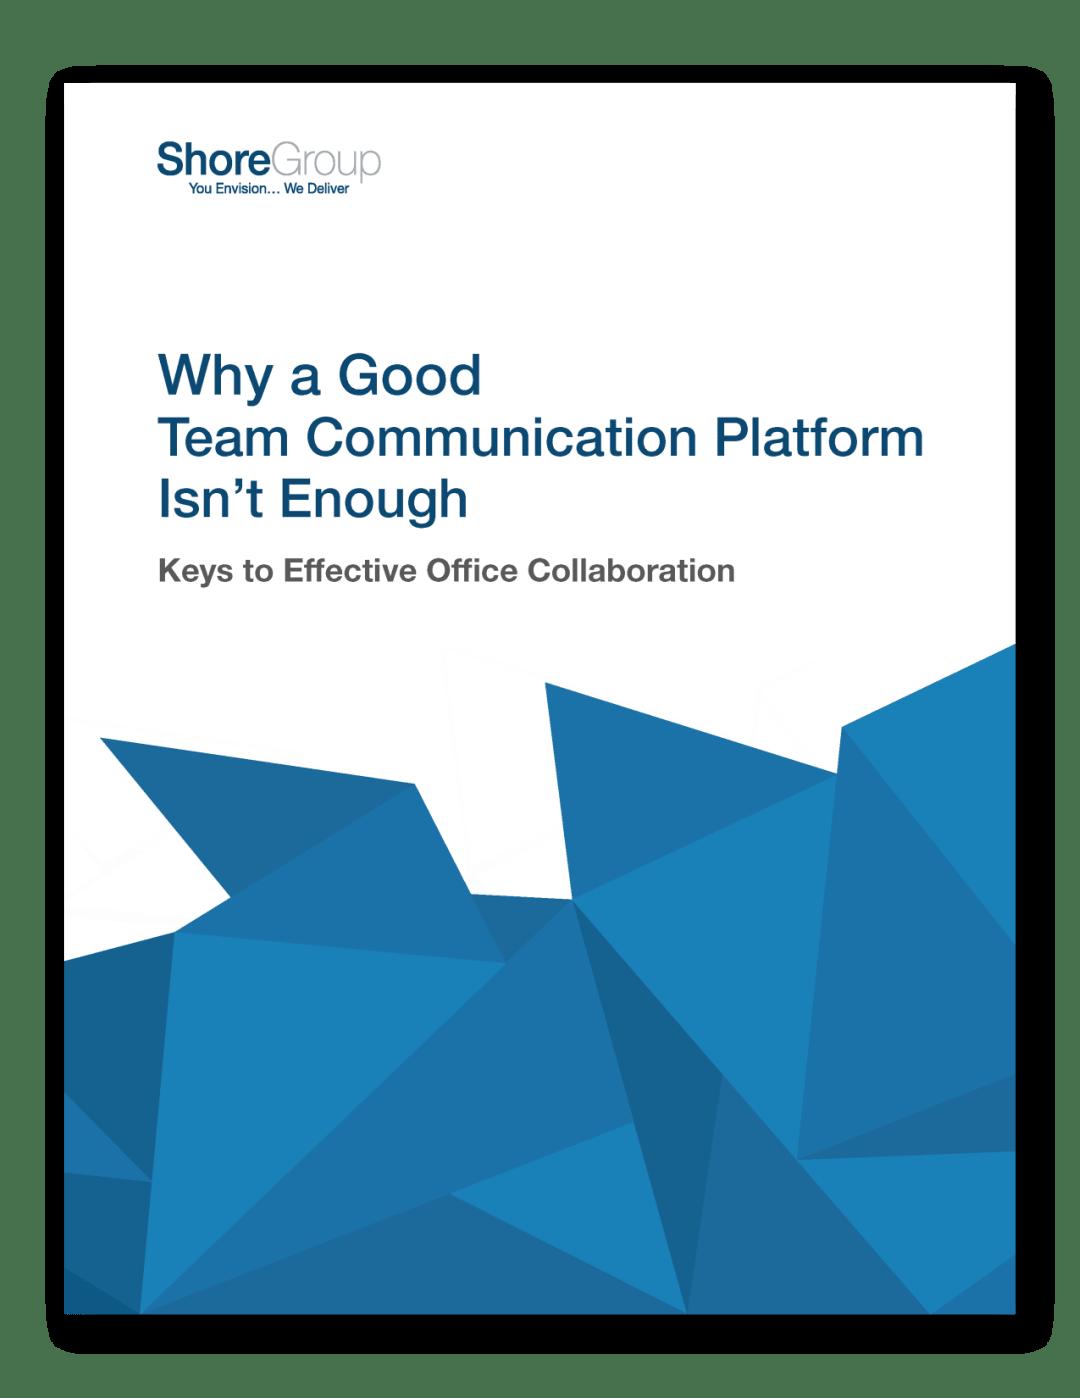 Why a Good Team Communication Platform Isn't Enough Whitepaper ShoreGroup